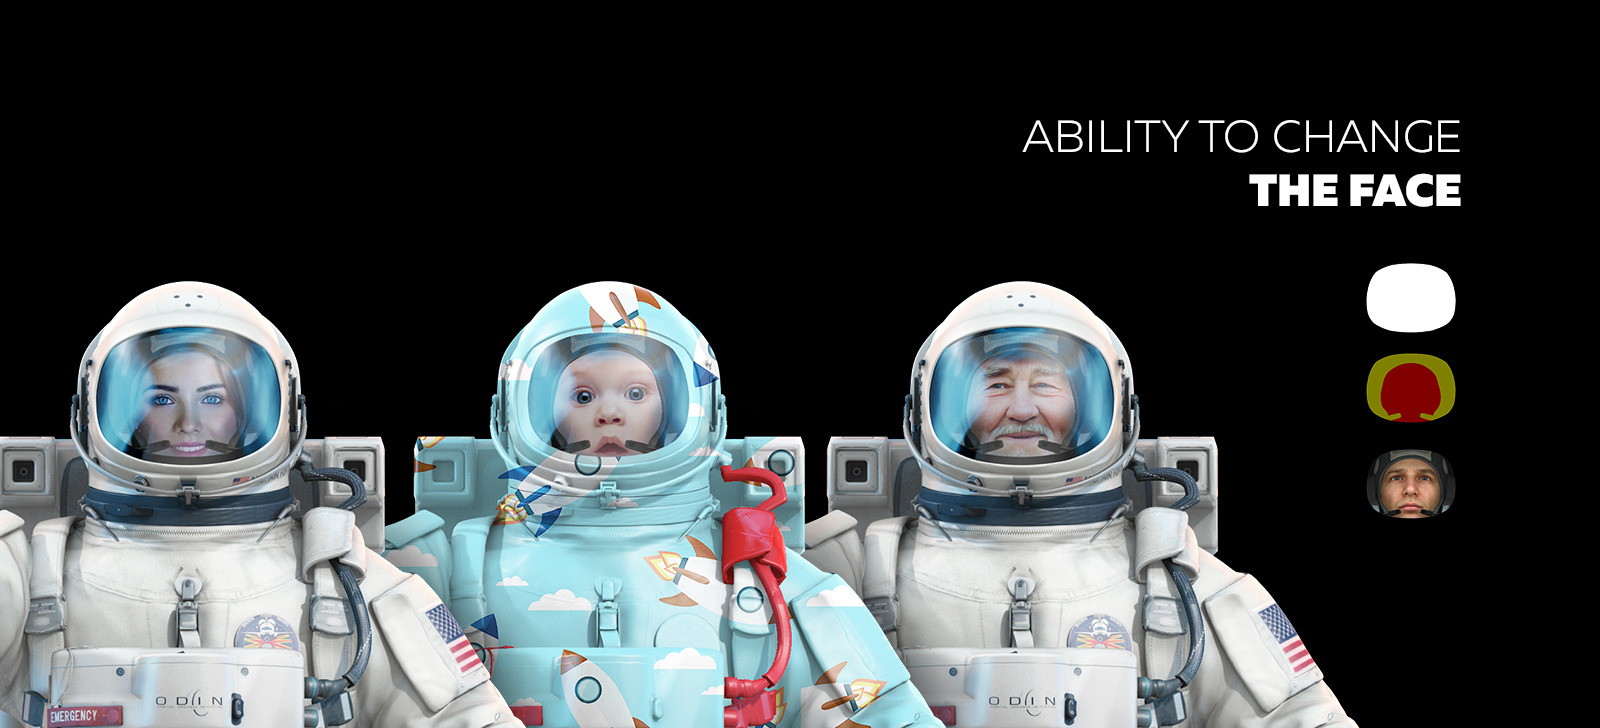 3D Mockup Space Astronaut #12